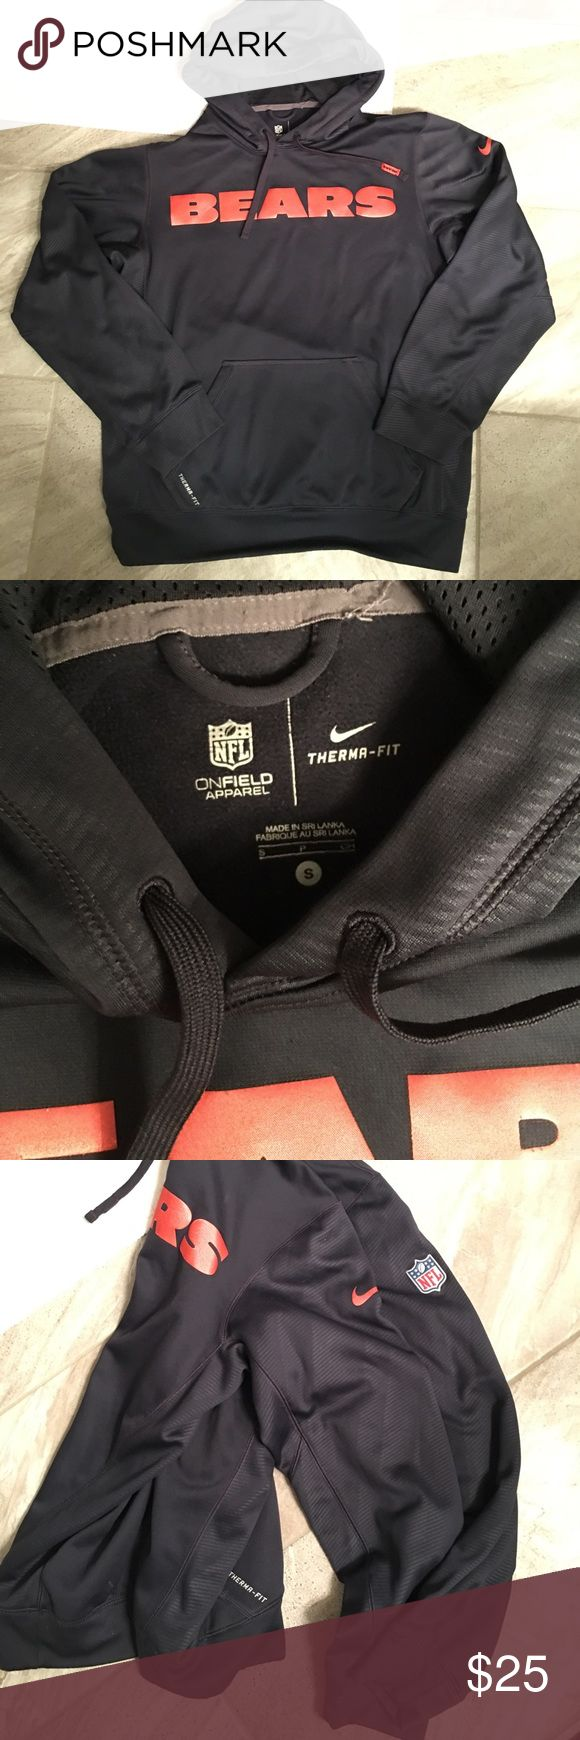 Nike Chicago Bears Hoodie Nike Chicago Bears Hoodie. Dri fit. Great condition. Men's Small Nike Shirts Sweatshirts & Hoodies